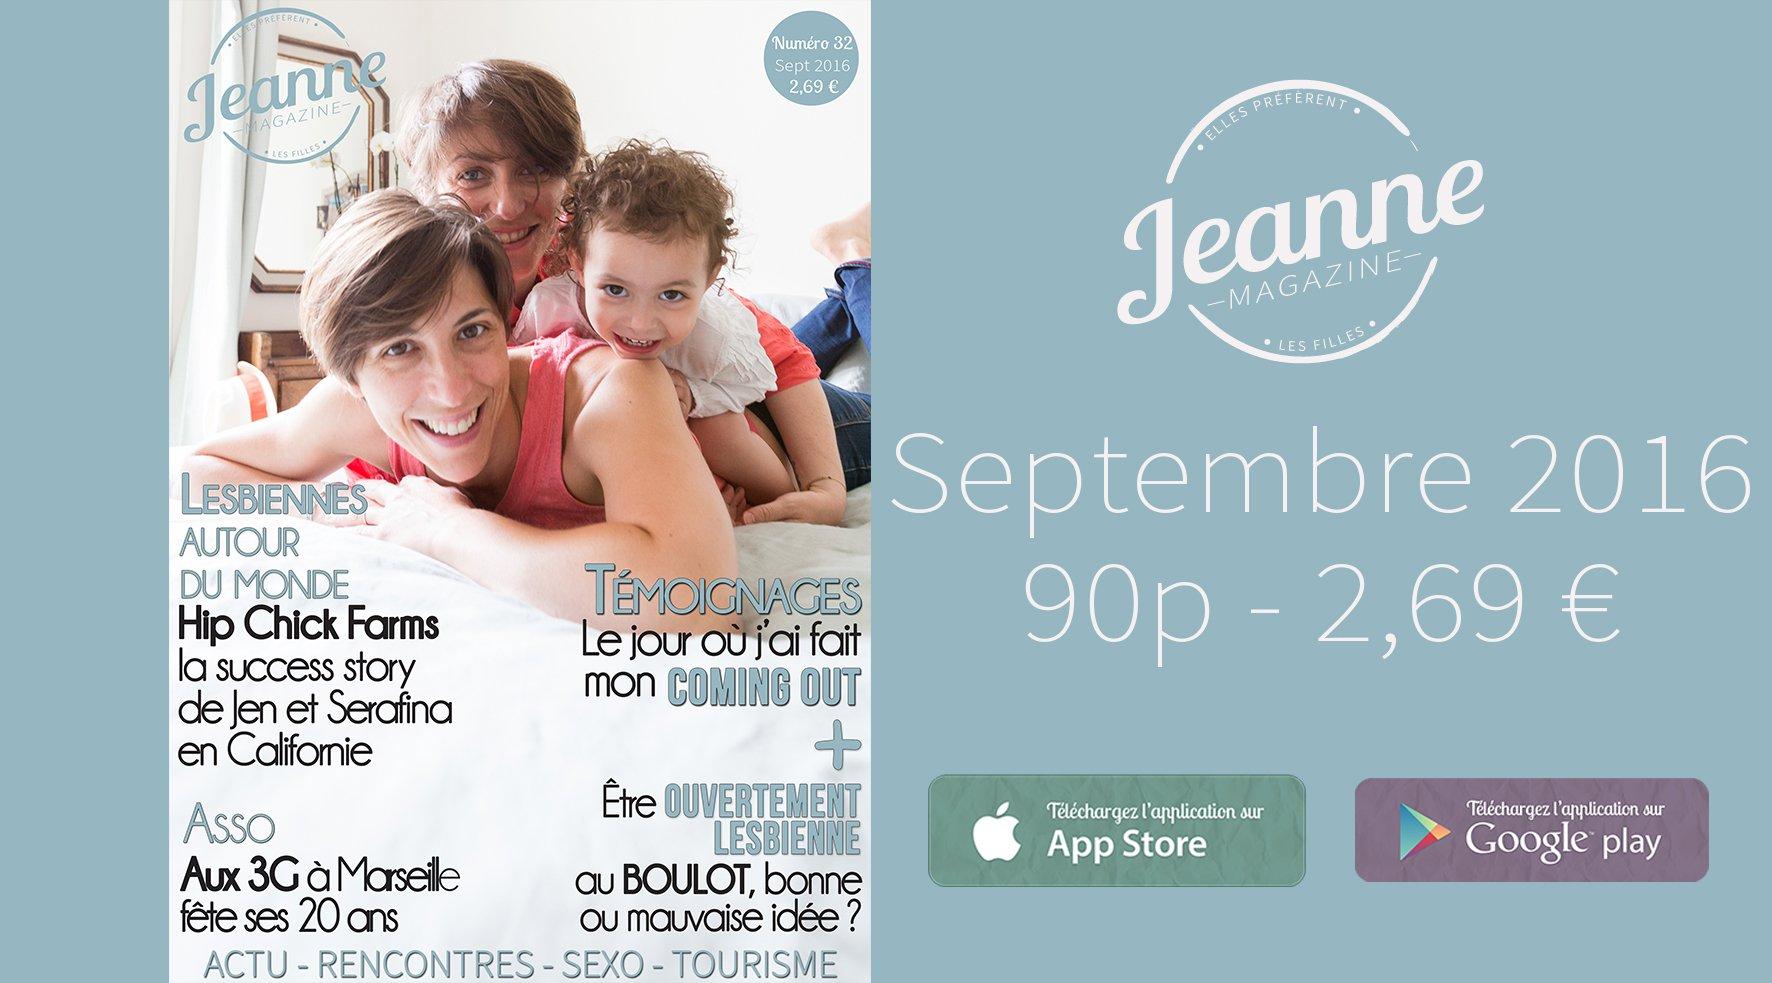 Sortie de Jeanne Magazine n°32 – septembre 2016